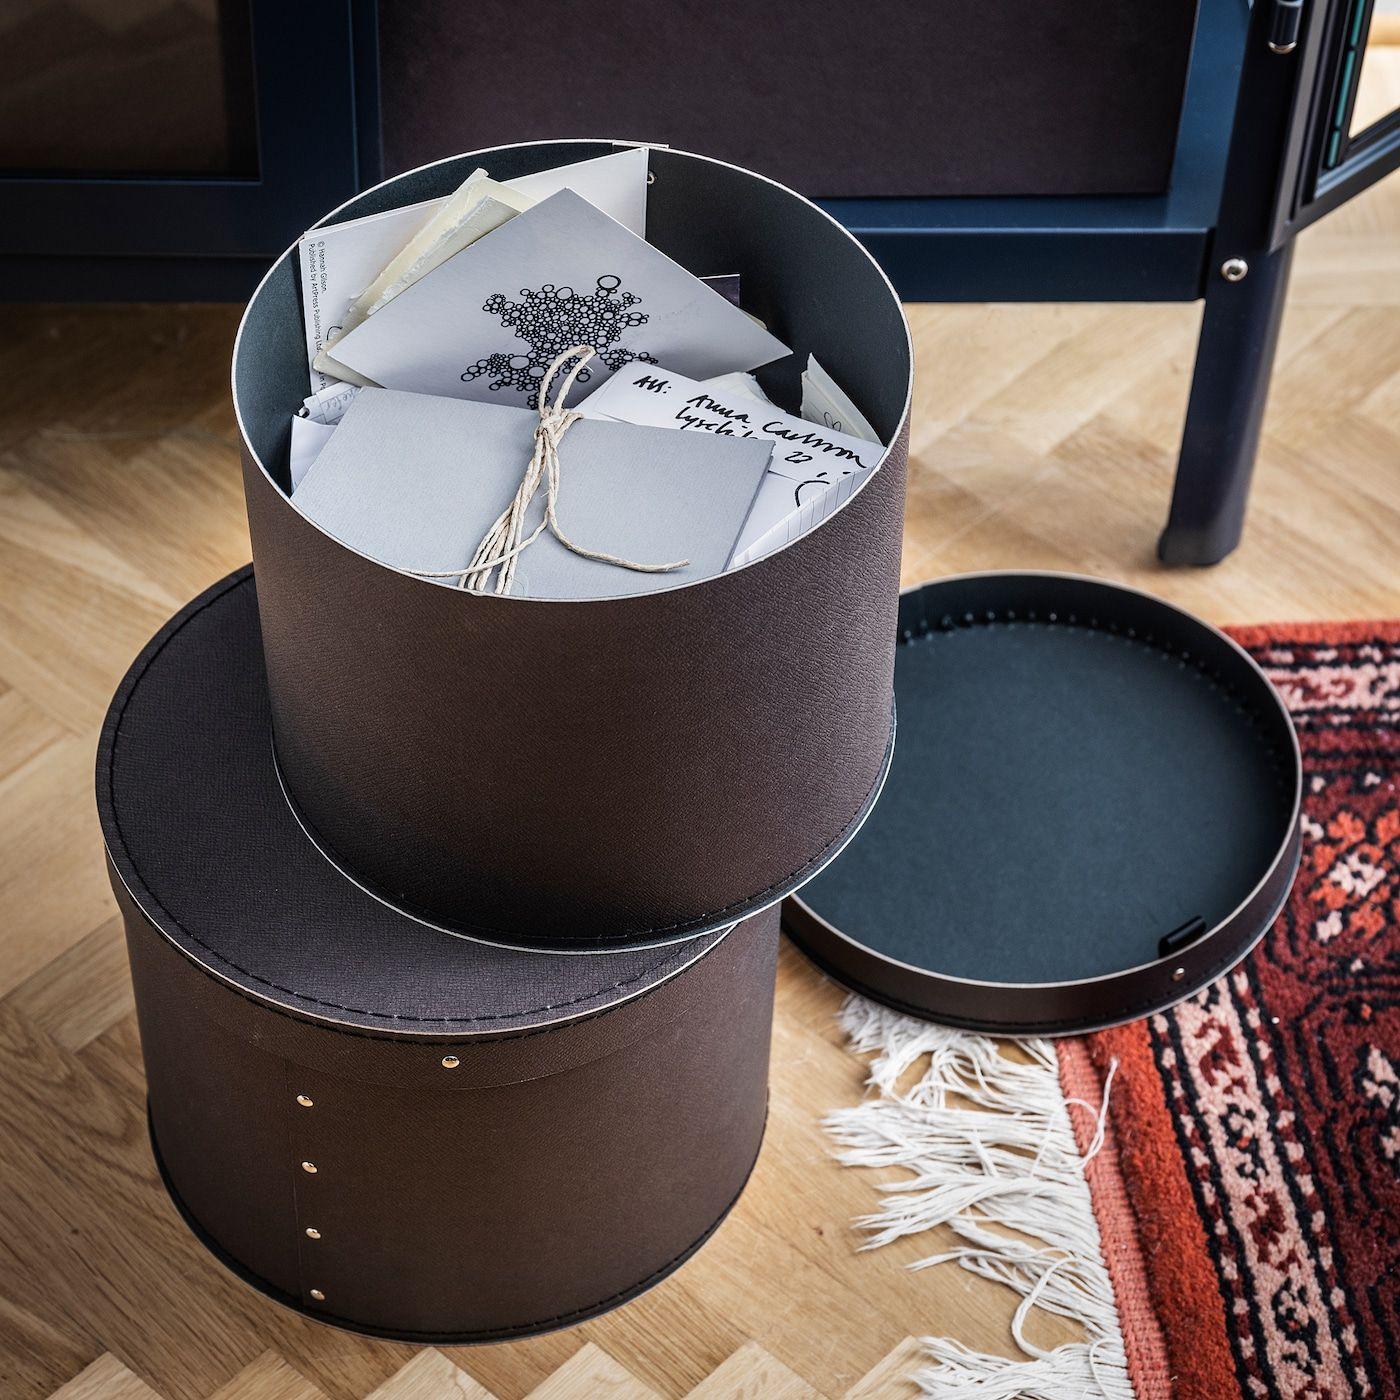 Ikea Anilinare Storage Box With Lid Set Of 2 Dark Brown In 2021 Storage Boxes With Lids Box With Lid Storage Box